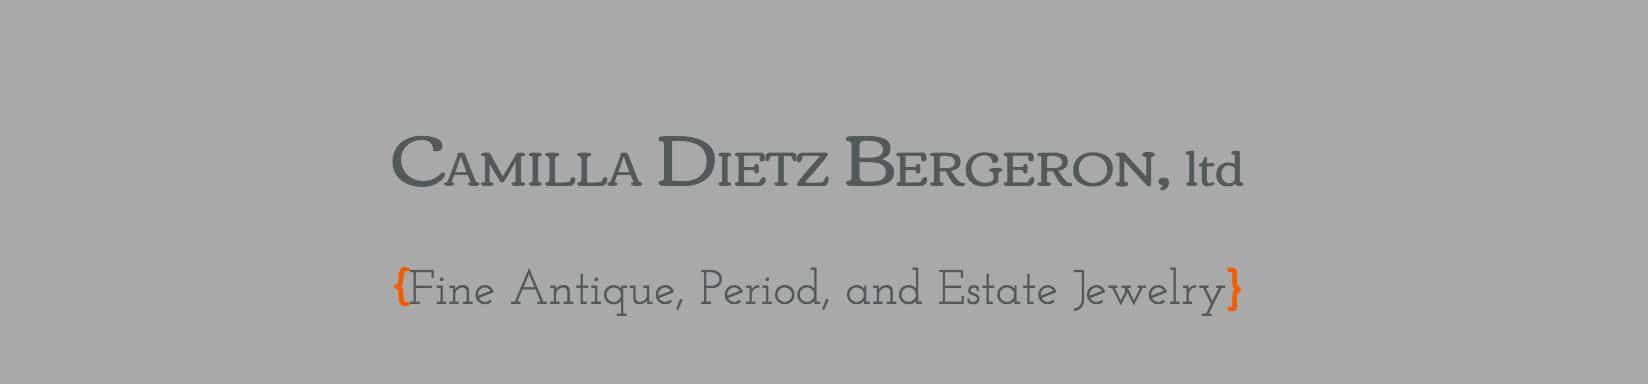 camilla-dietz-bergeron